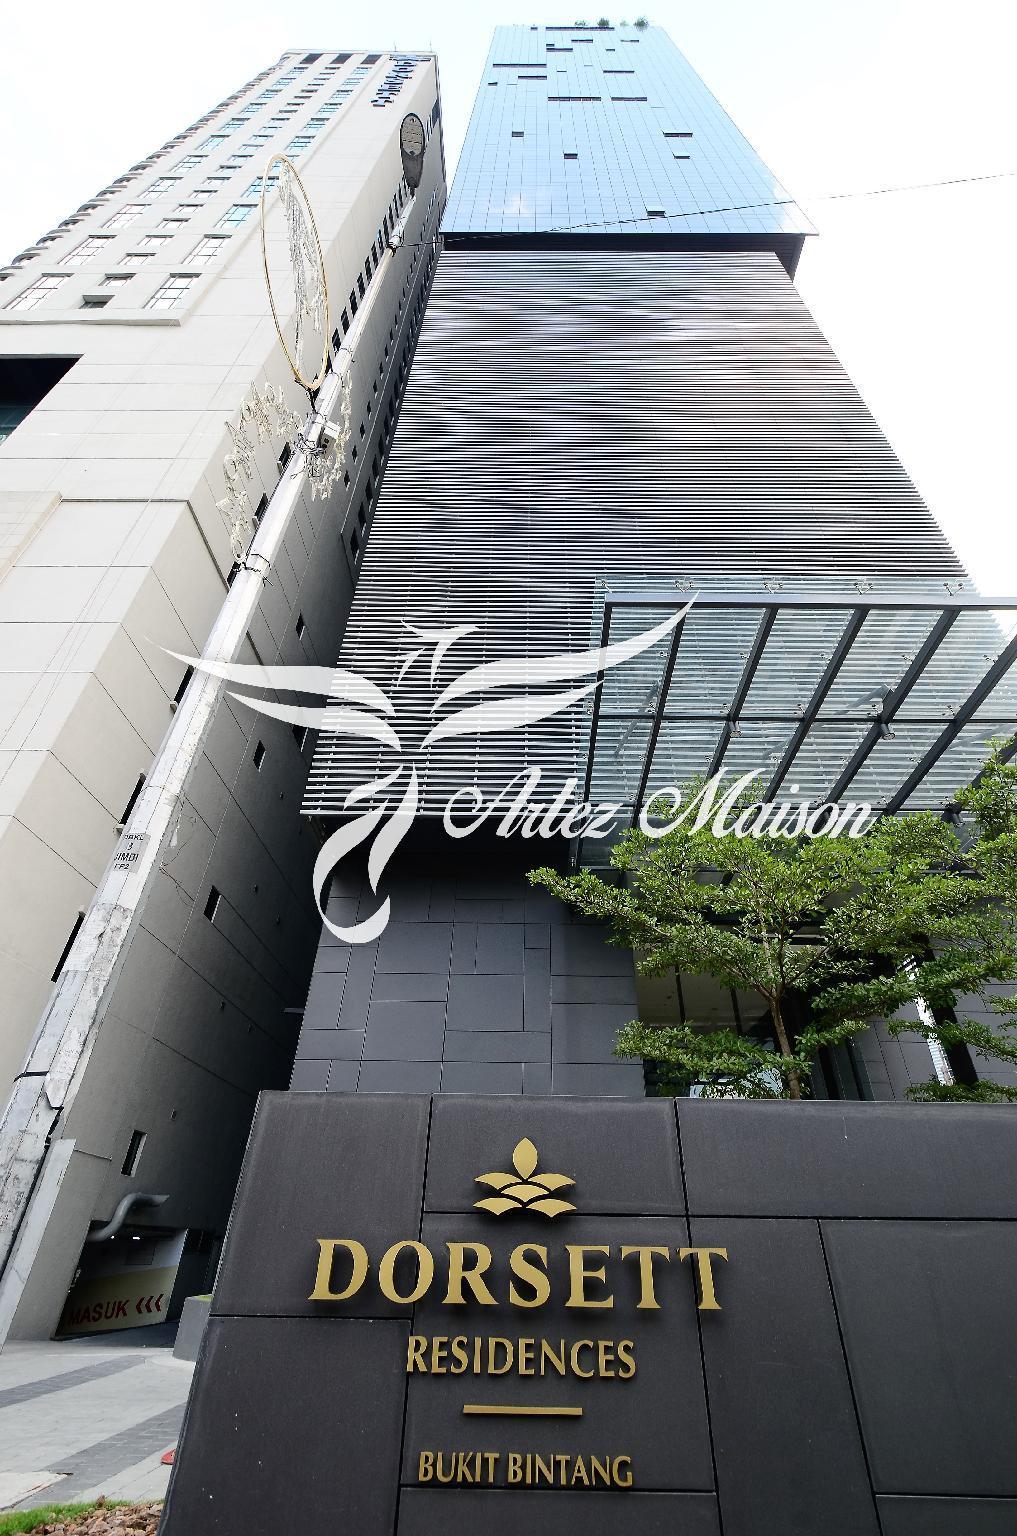 Dorsett Residences Bukit Bintang @ Artez Maison